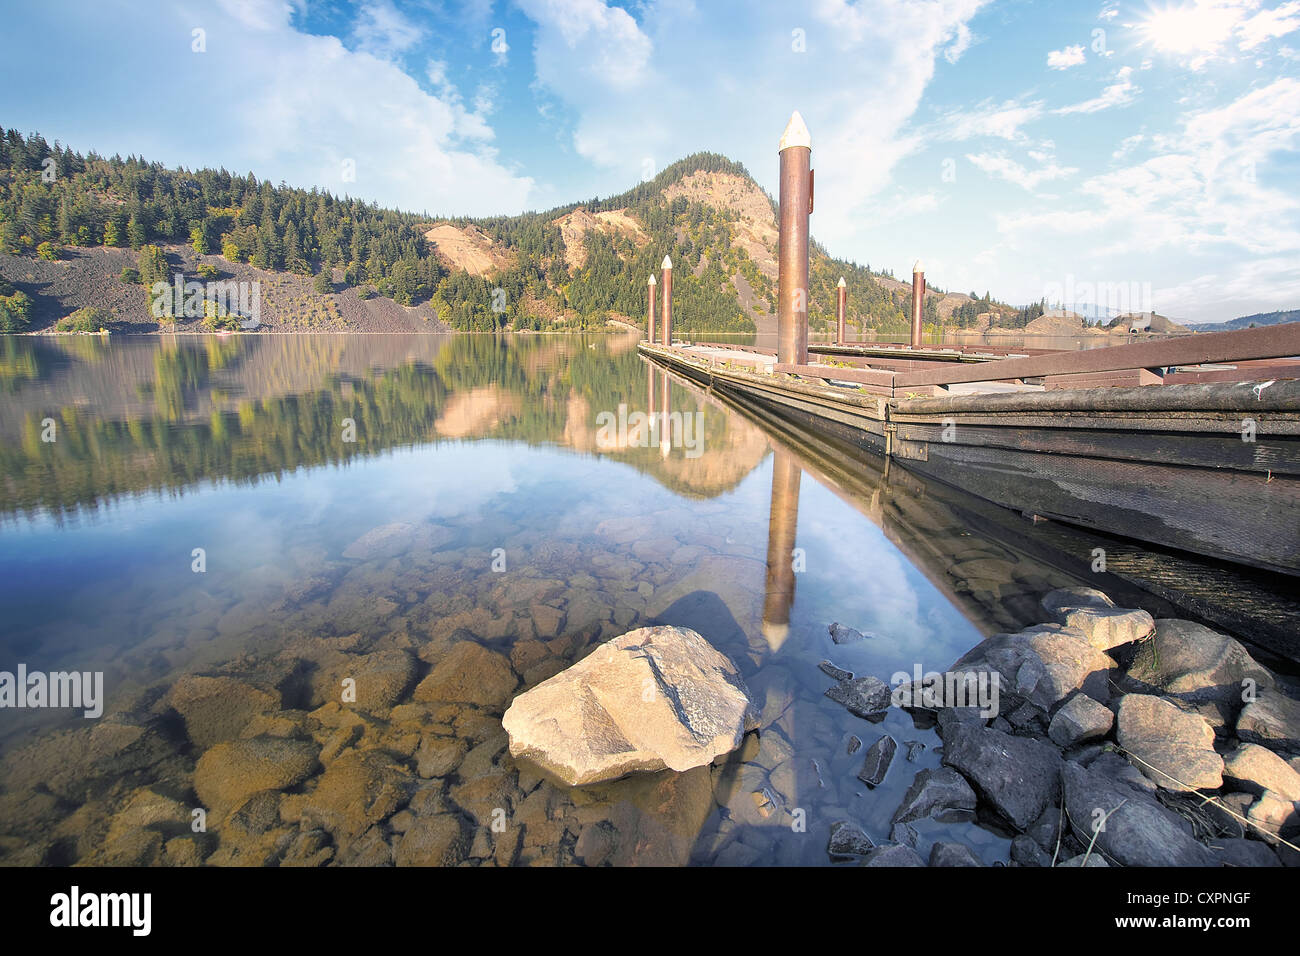 Boat Docks Moorage at Drano Lake in Washington State - Stock Image